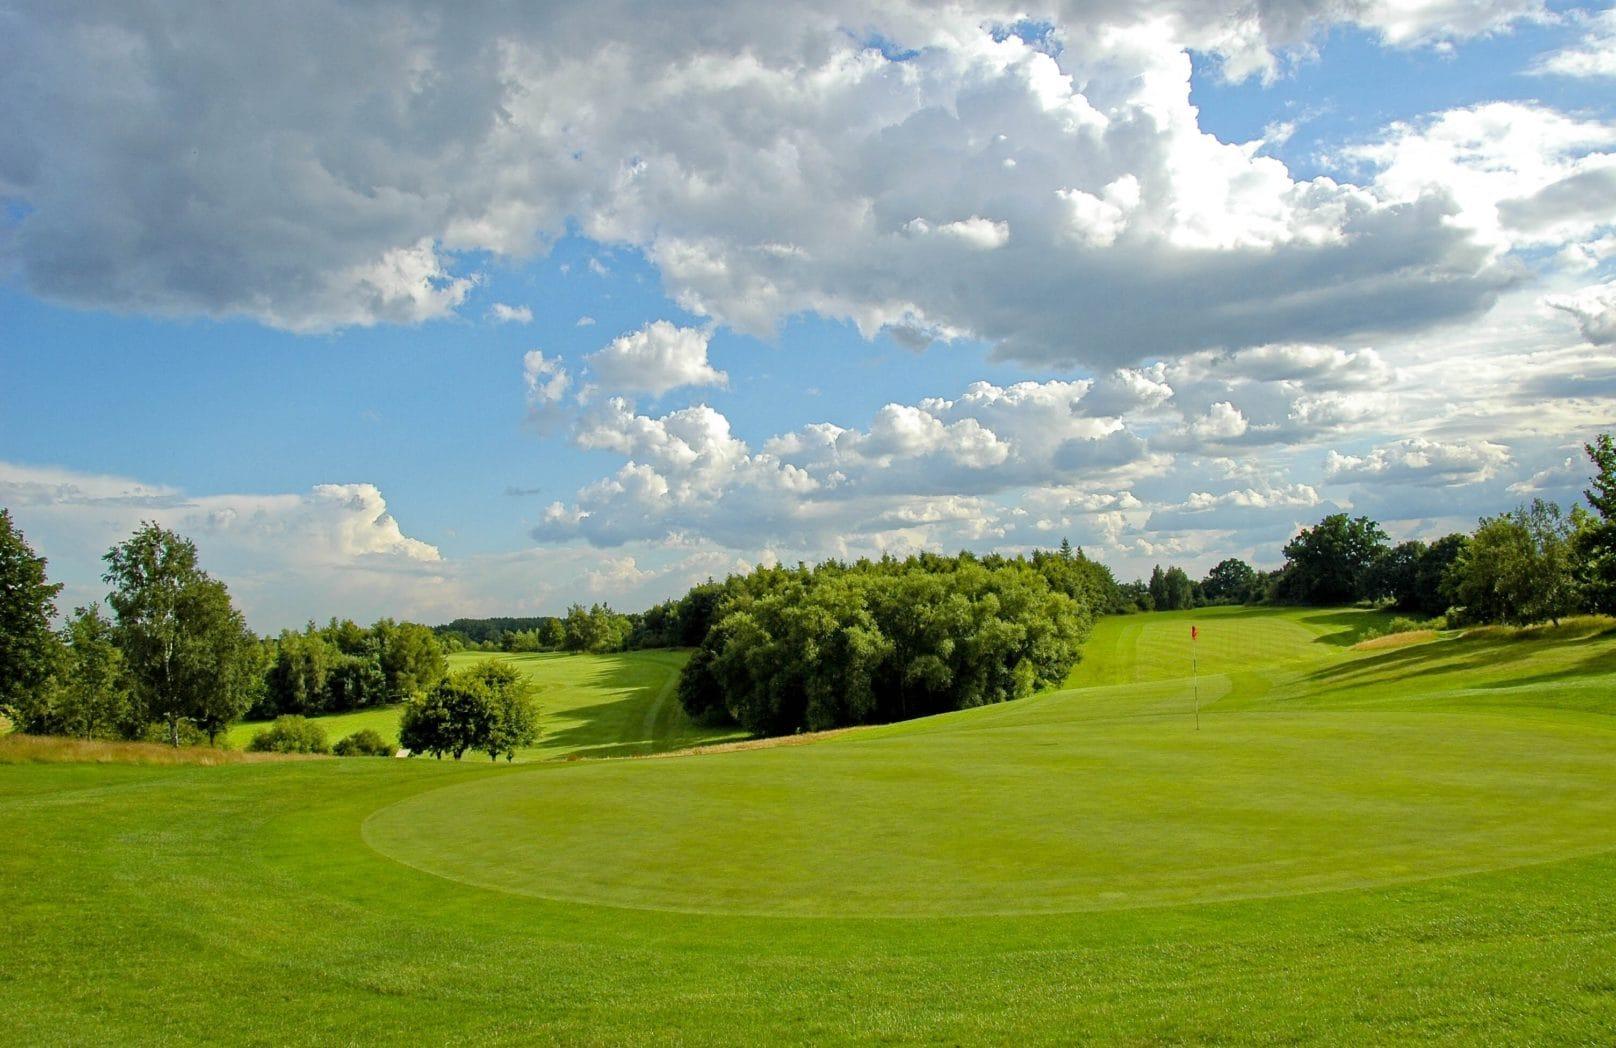 Golf Course Essex - Constable